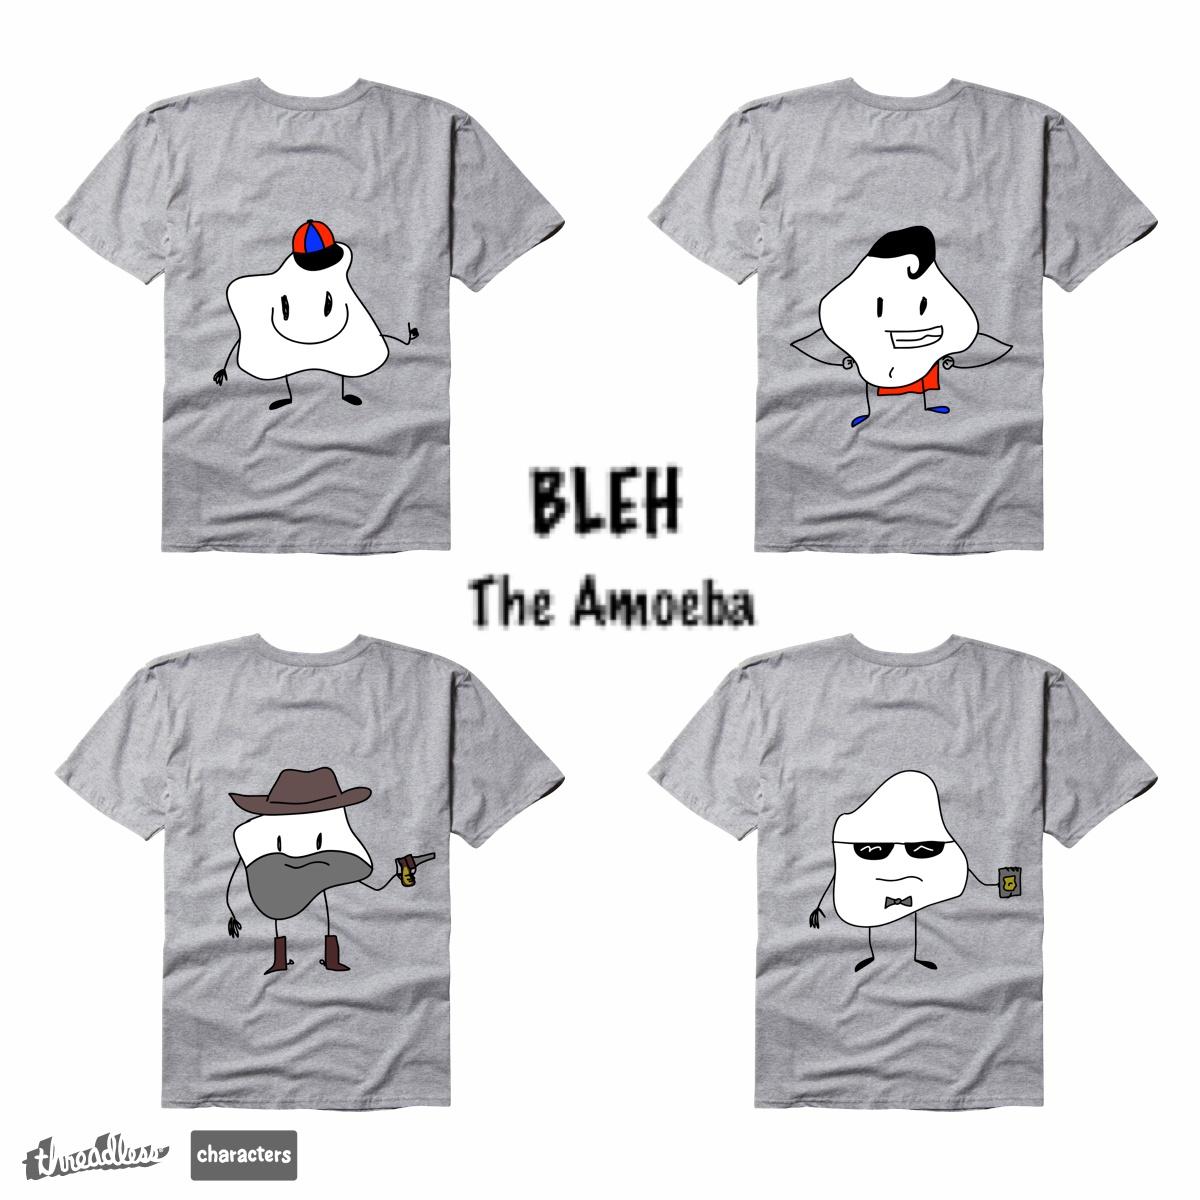 BLEH (The Amoeba) by Wachtos on Threadless